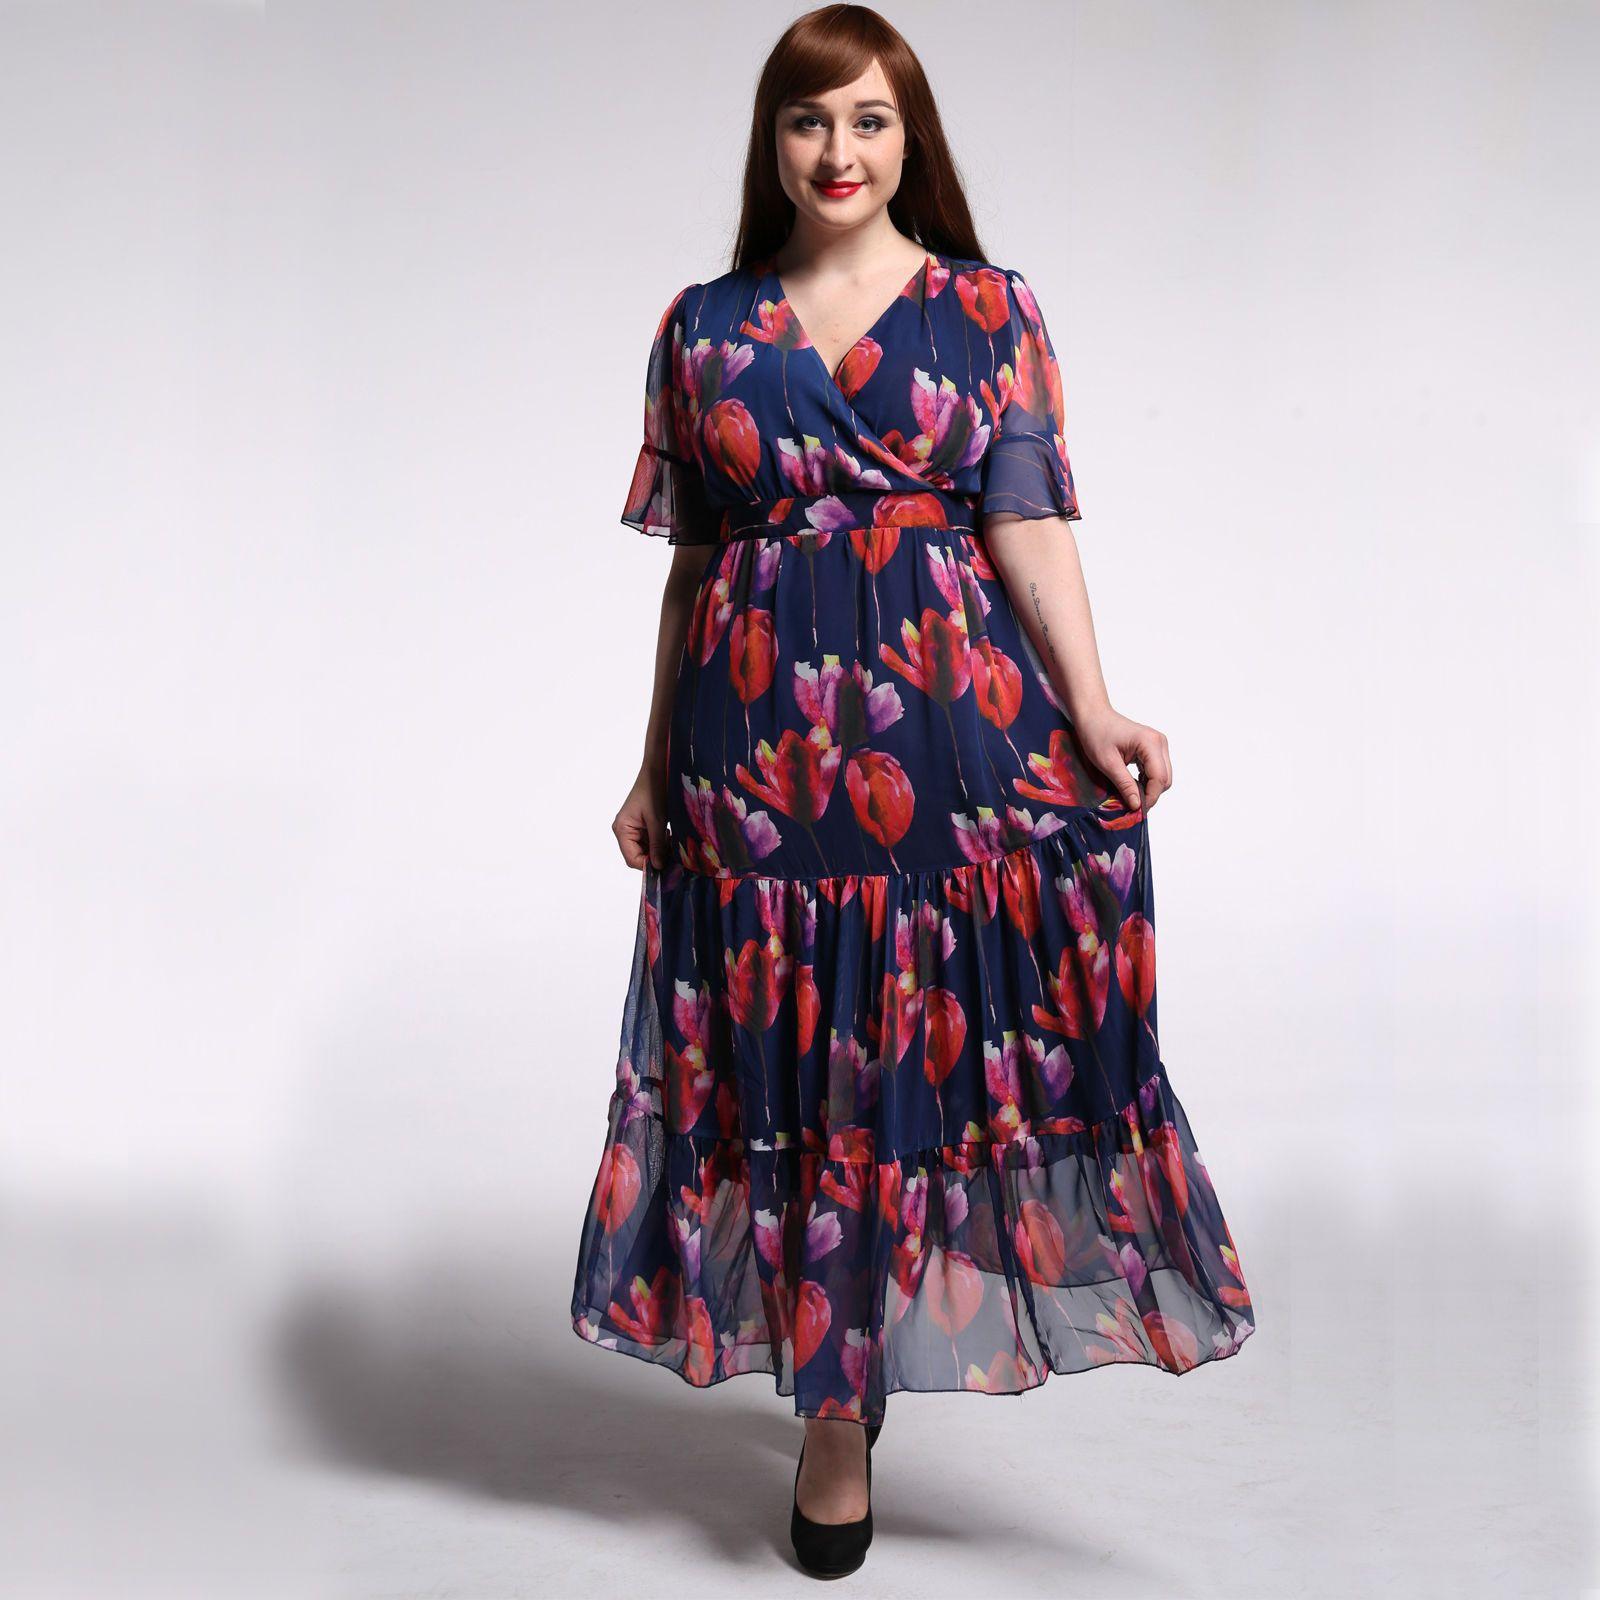 Plus size lxl bohemian beach long dress summer everyday womens